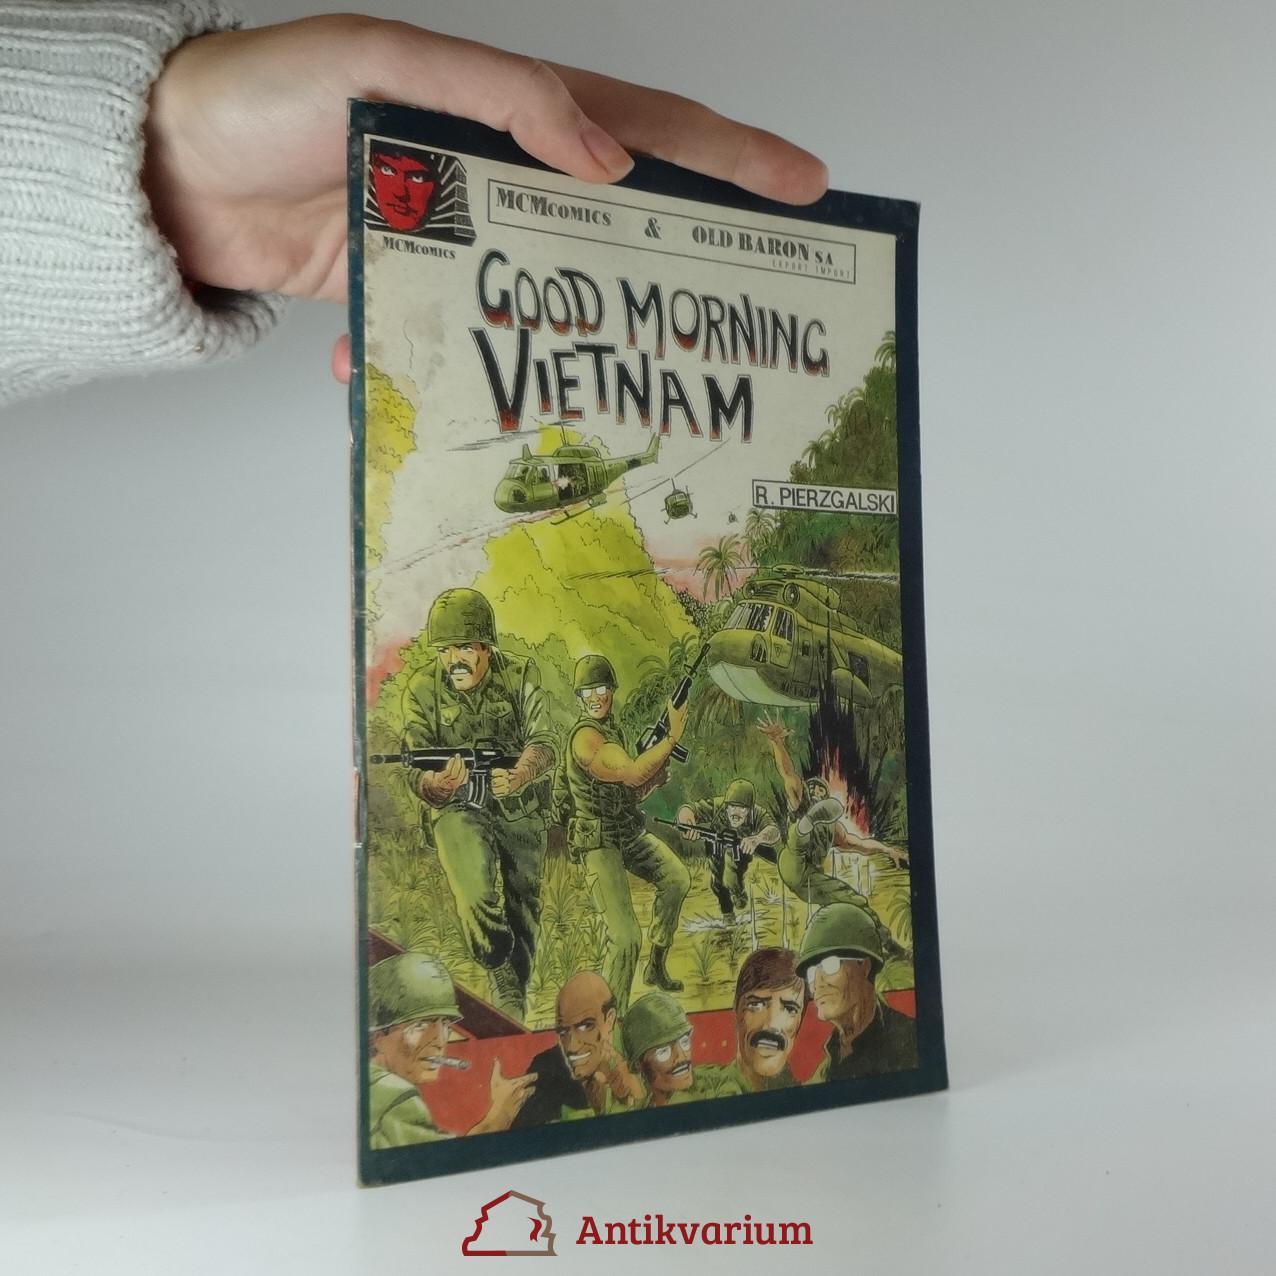 antikvární kniha Good morning Vietnam, 1991